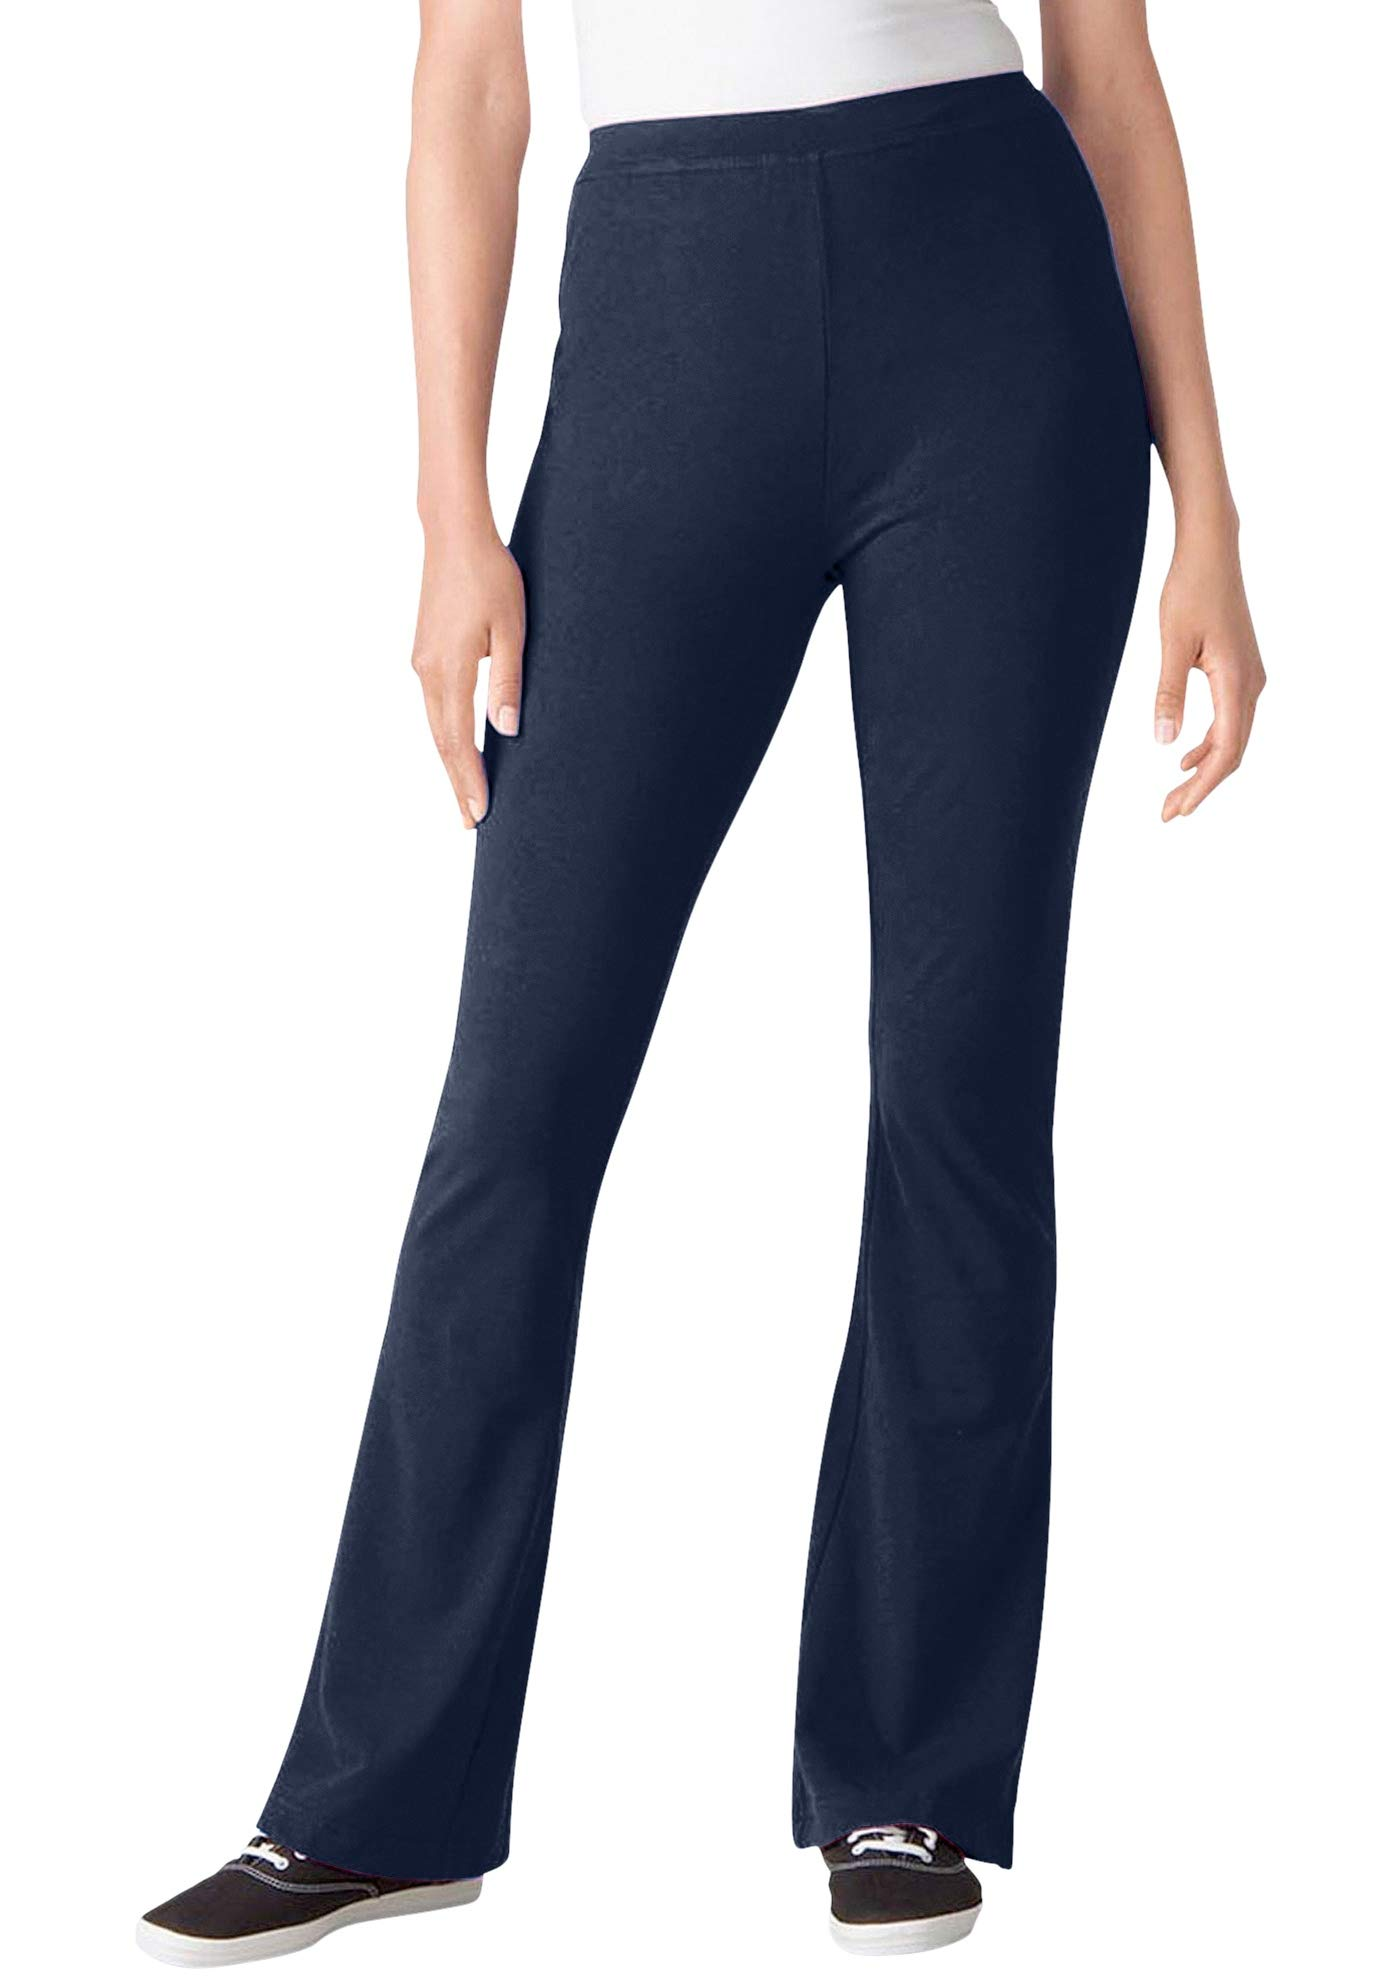 Woman Within Women's Plus Size Stretch Cotton Bootcut Yoga Pant